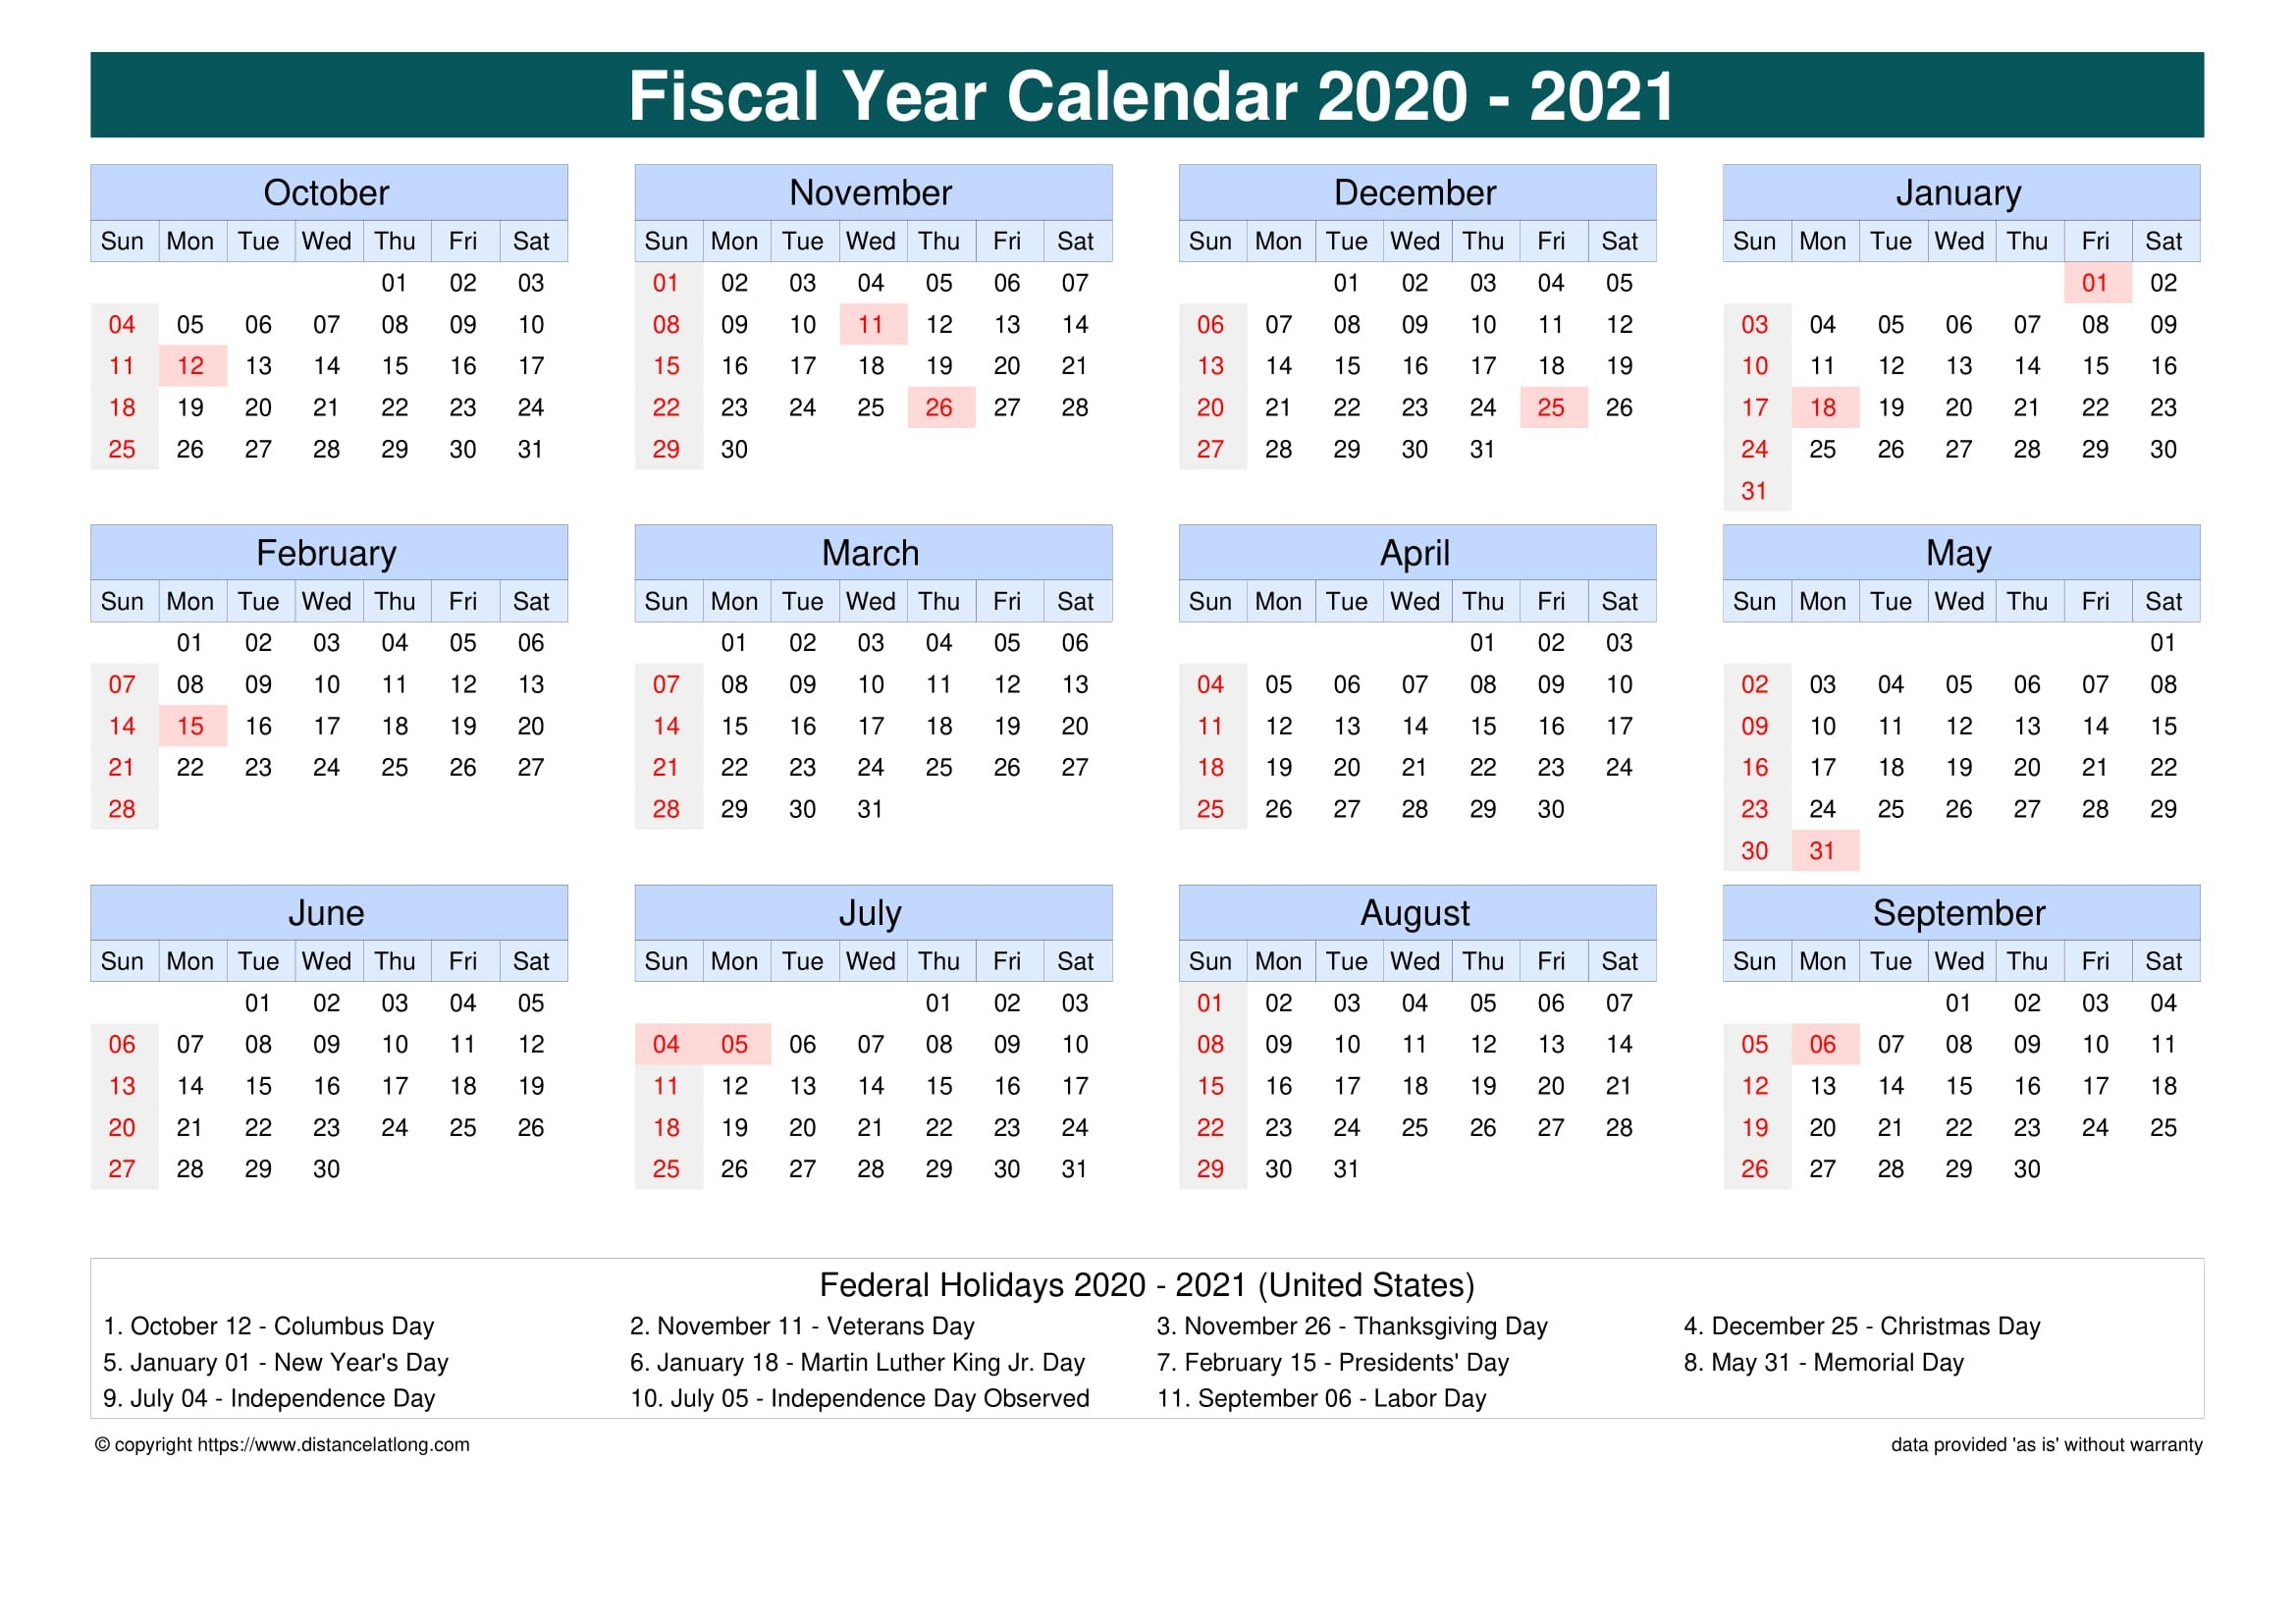 Fiscal Year 2020-2021 Calendar Templates, Free Printable  2021 To 2021 Financial Year Calender Australia